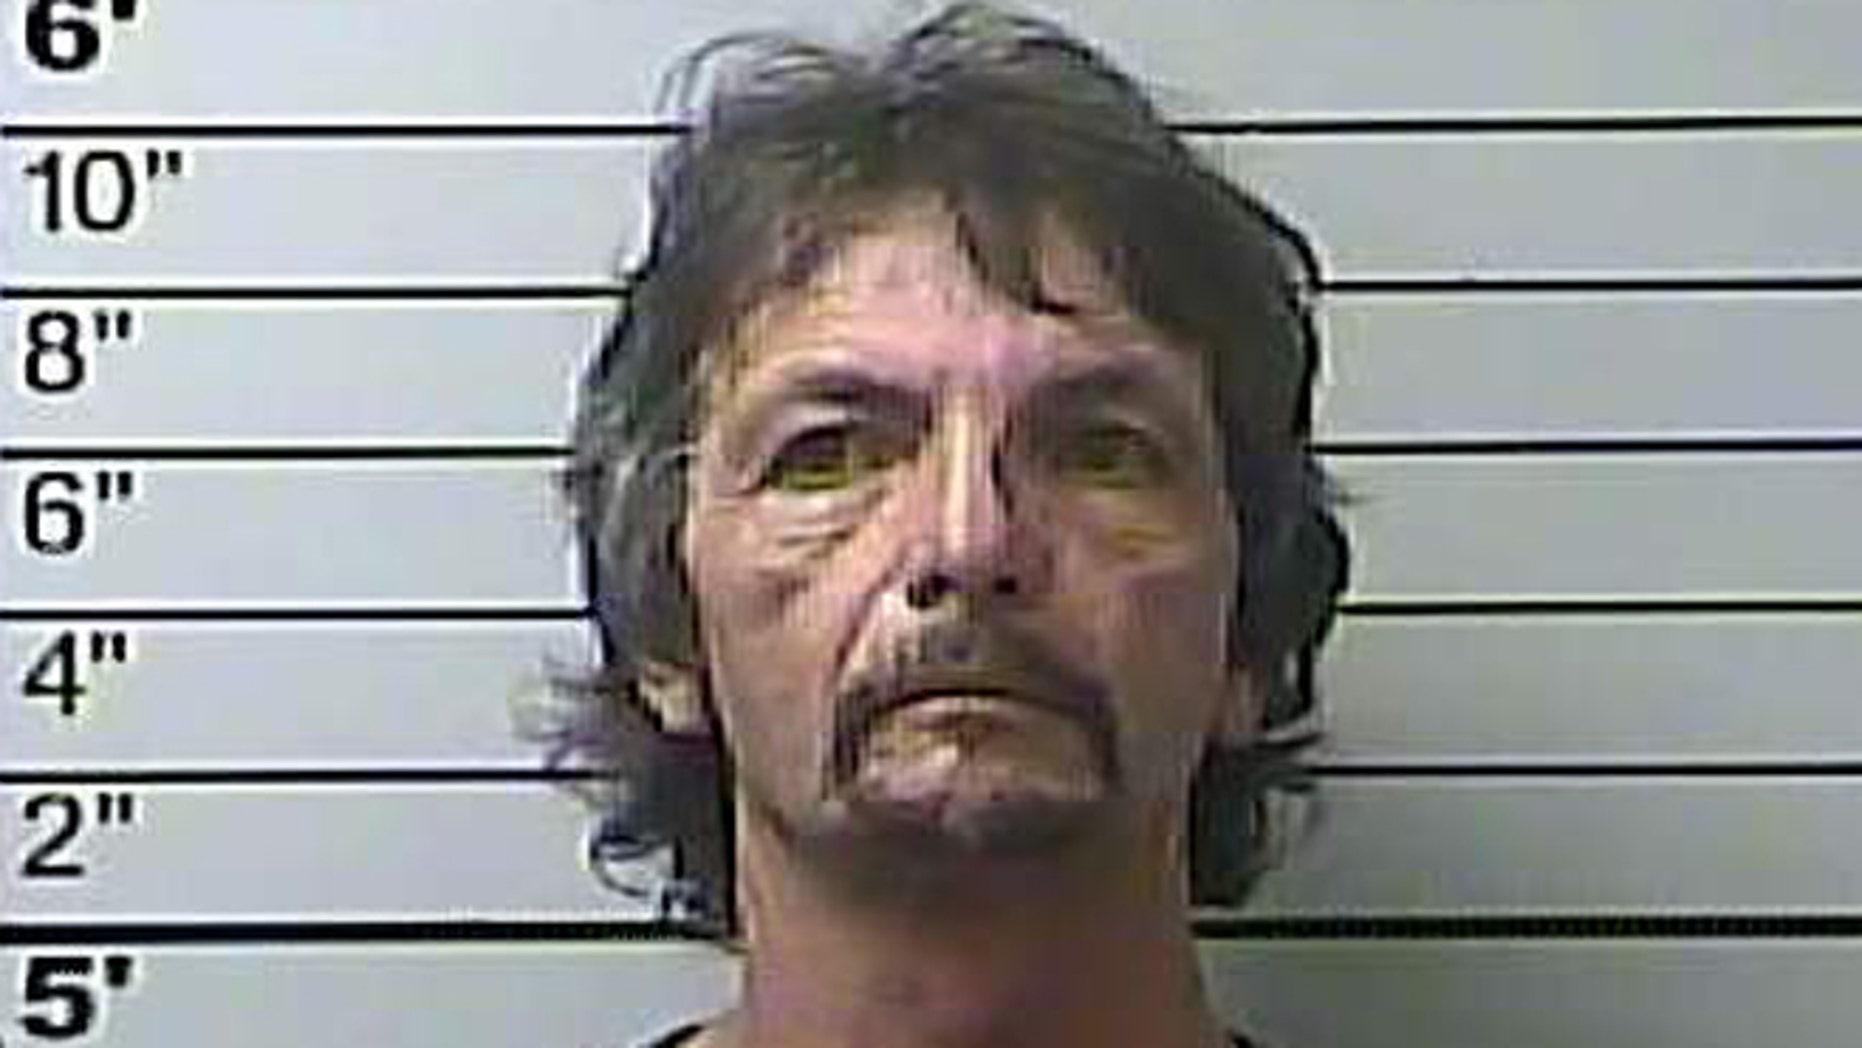 Marshall E. Leonard of Tupelo was jailed on a charge of detonating an explosive.